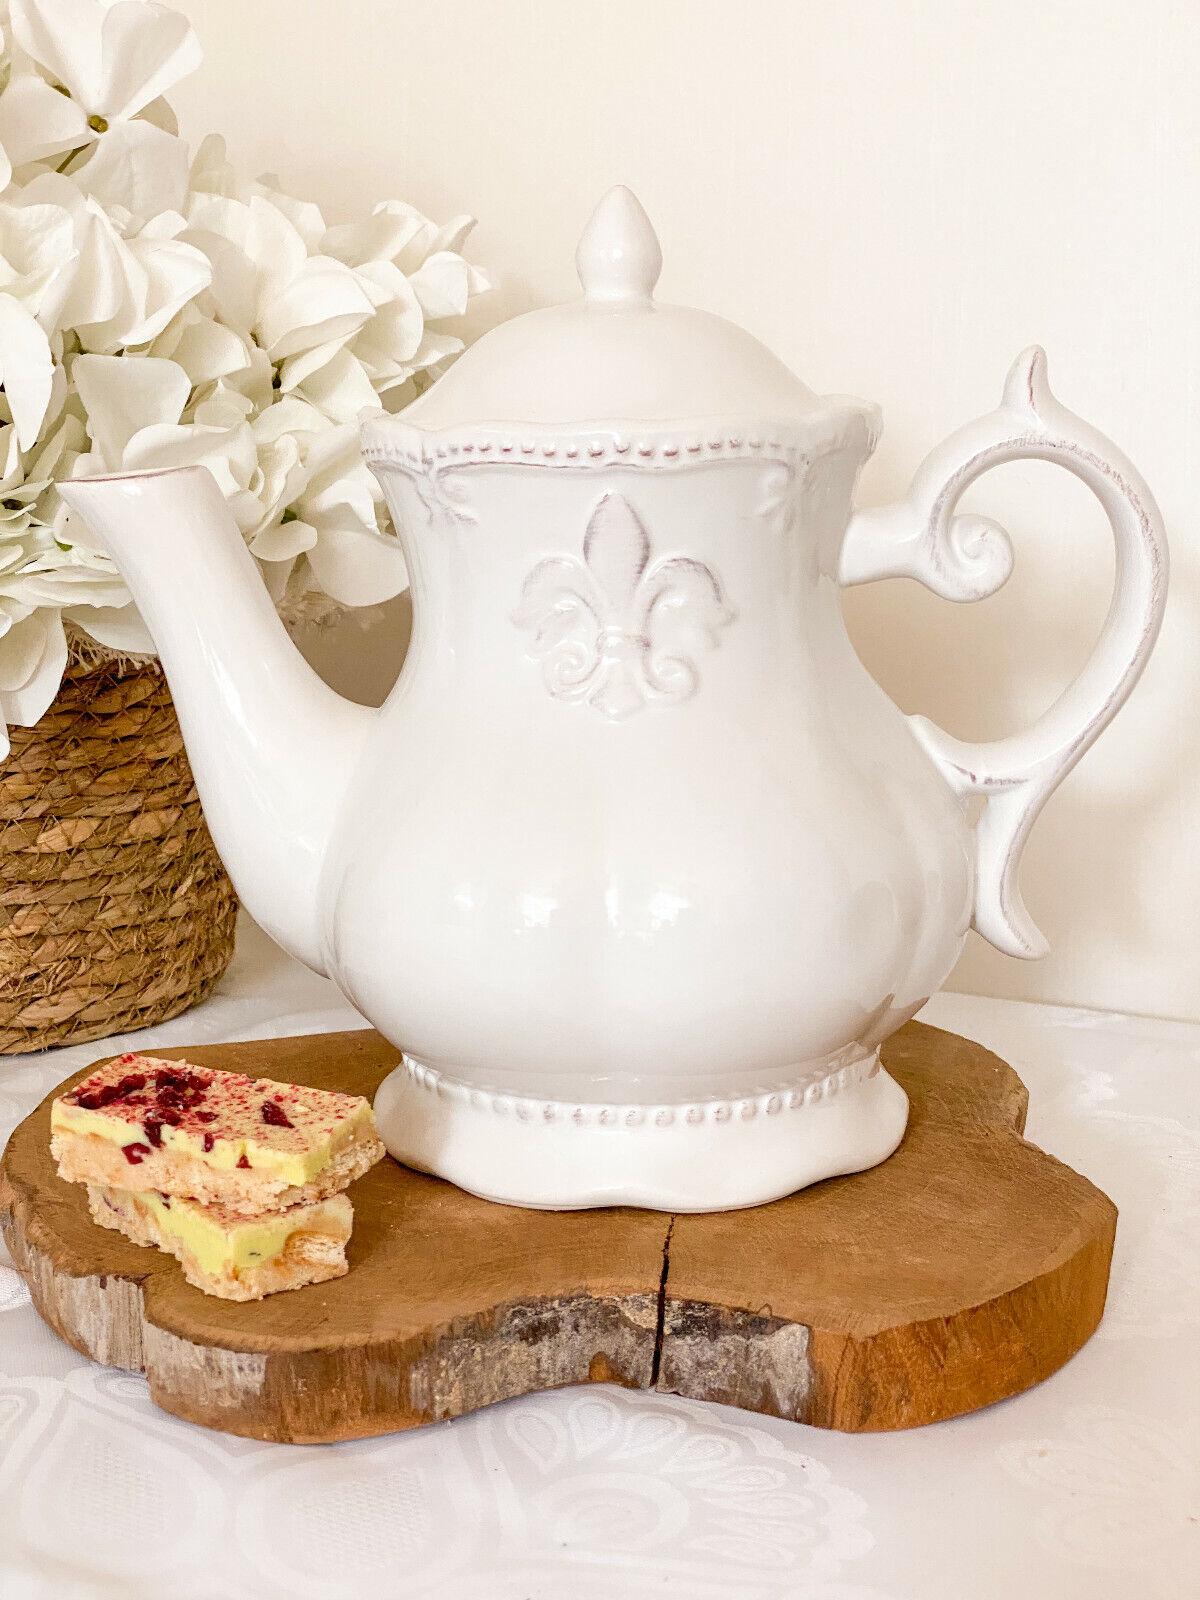 Clayre & Eef ♥ Teekanne Kaffeekanne Lilie Kanne Landhaus Shabby